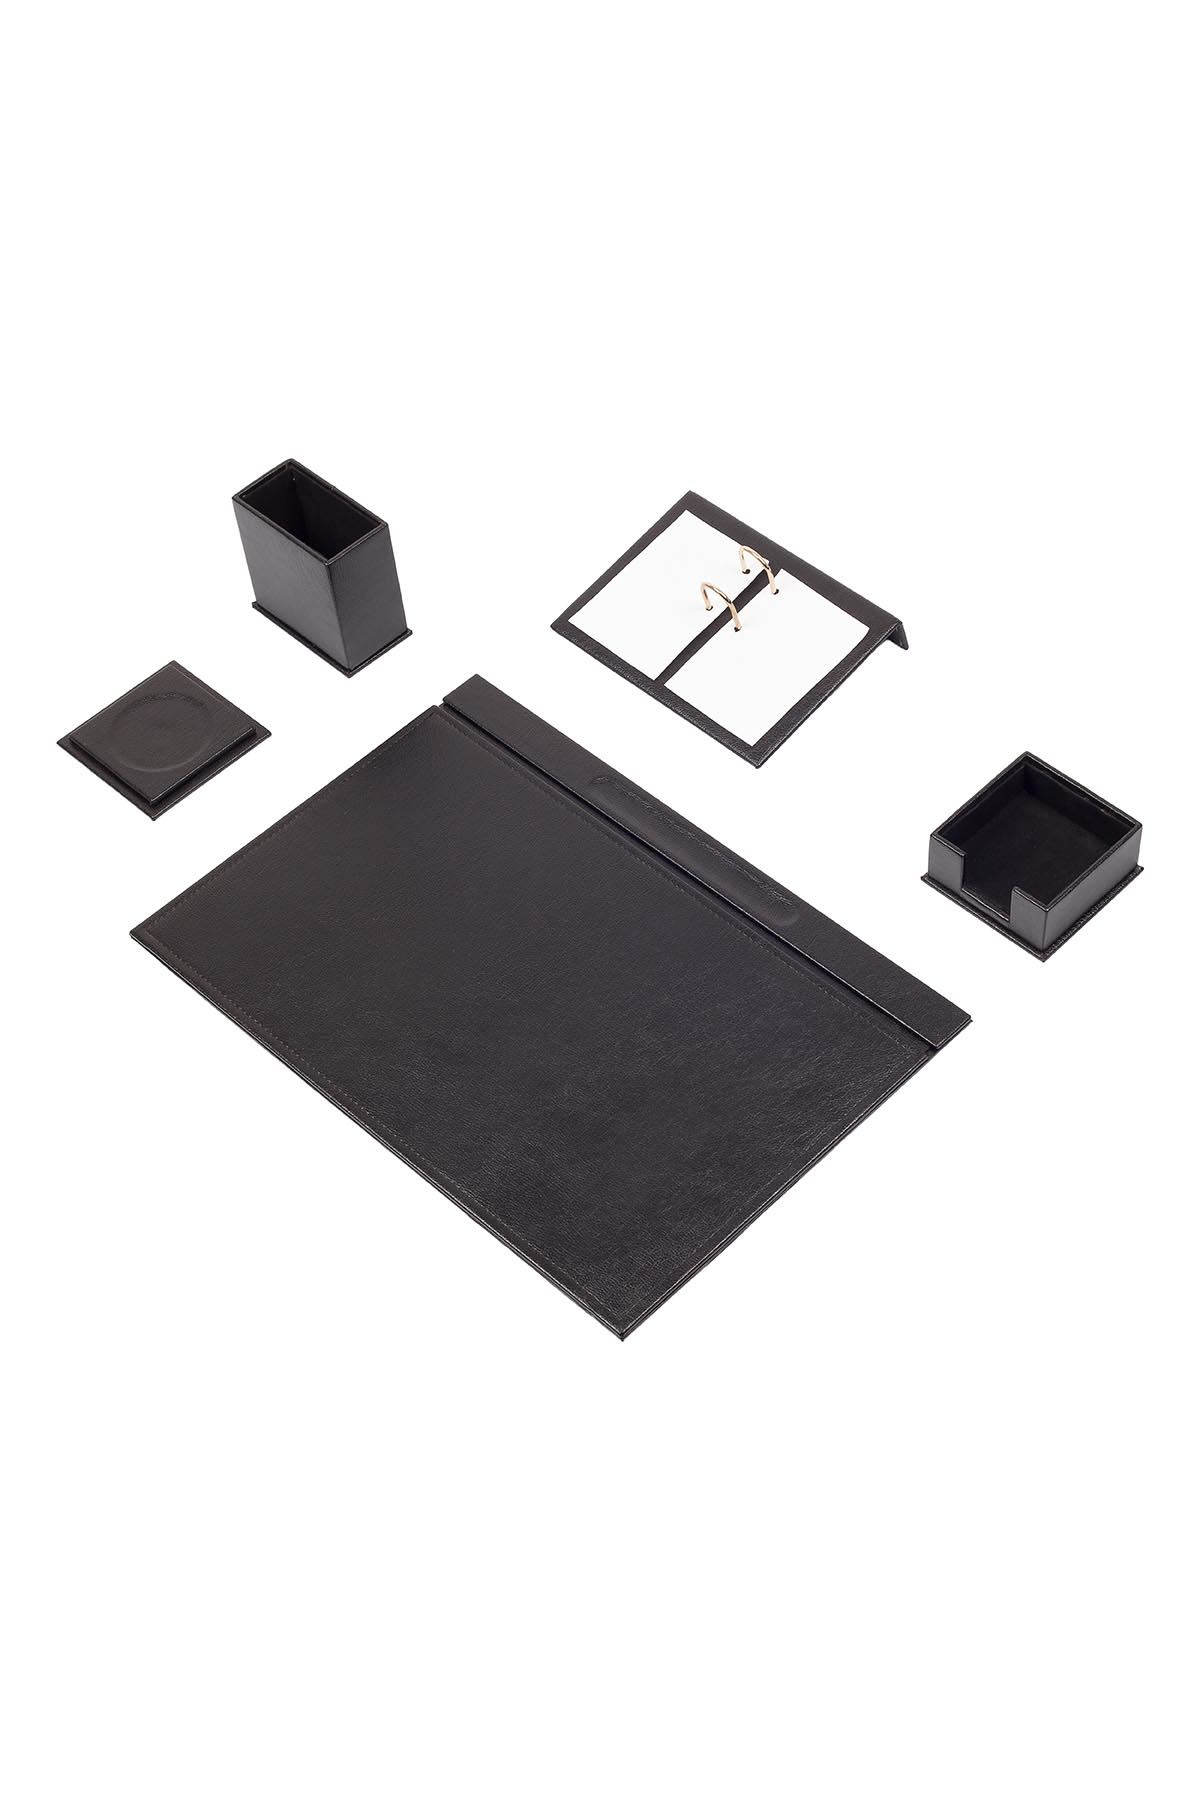 Leather Desk Set 5 Accessories Black